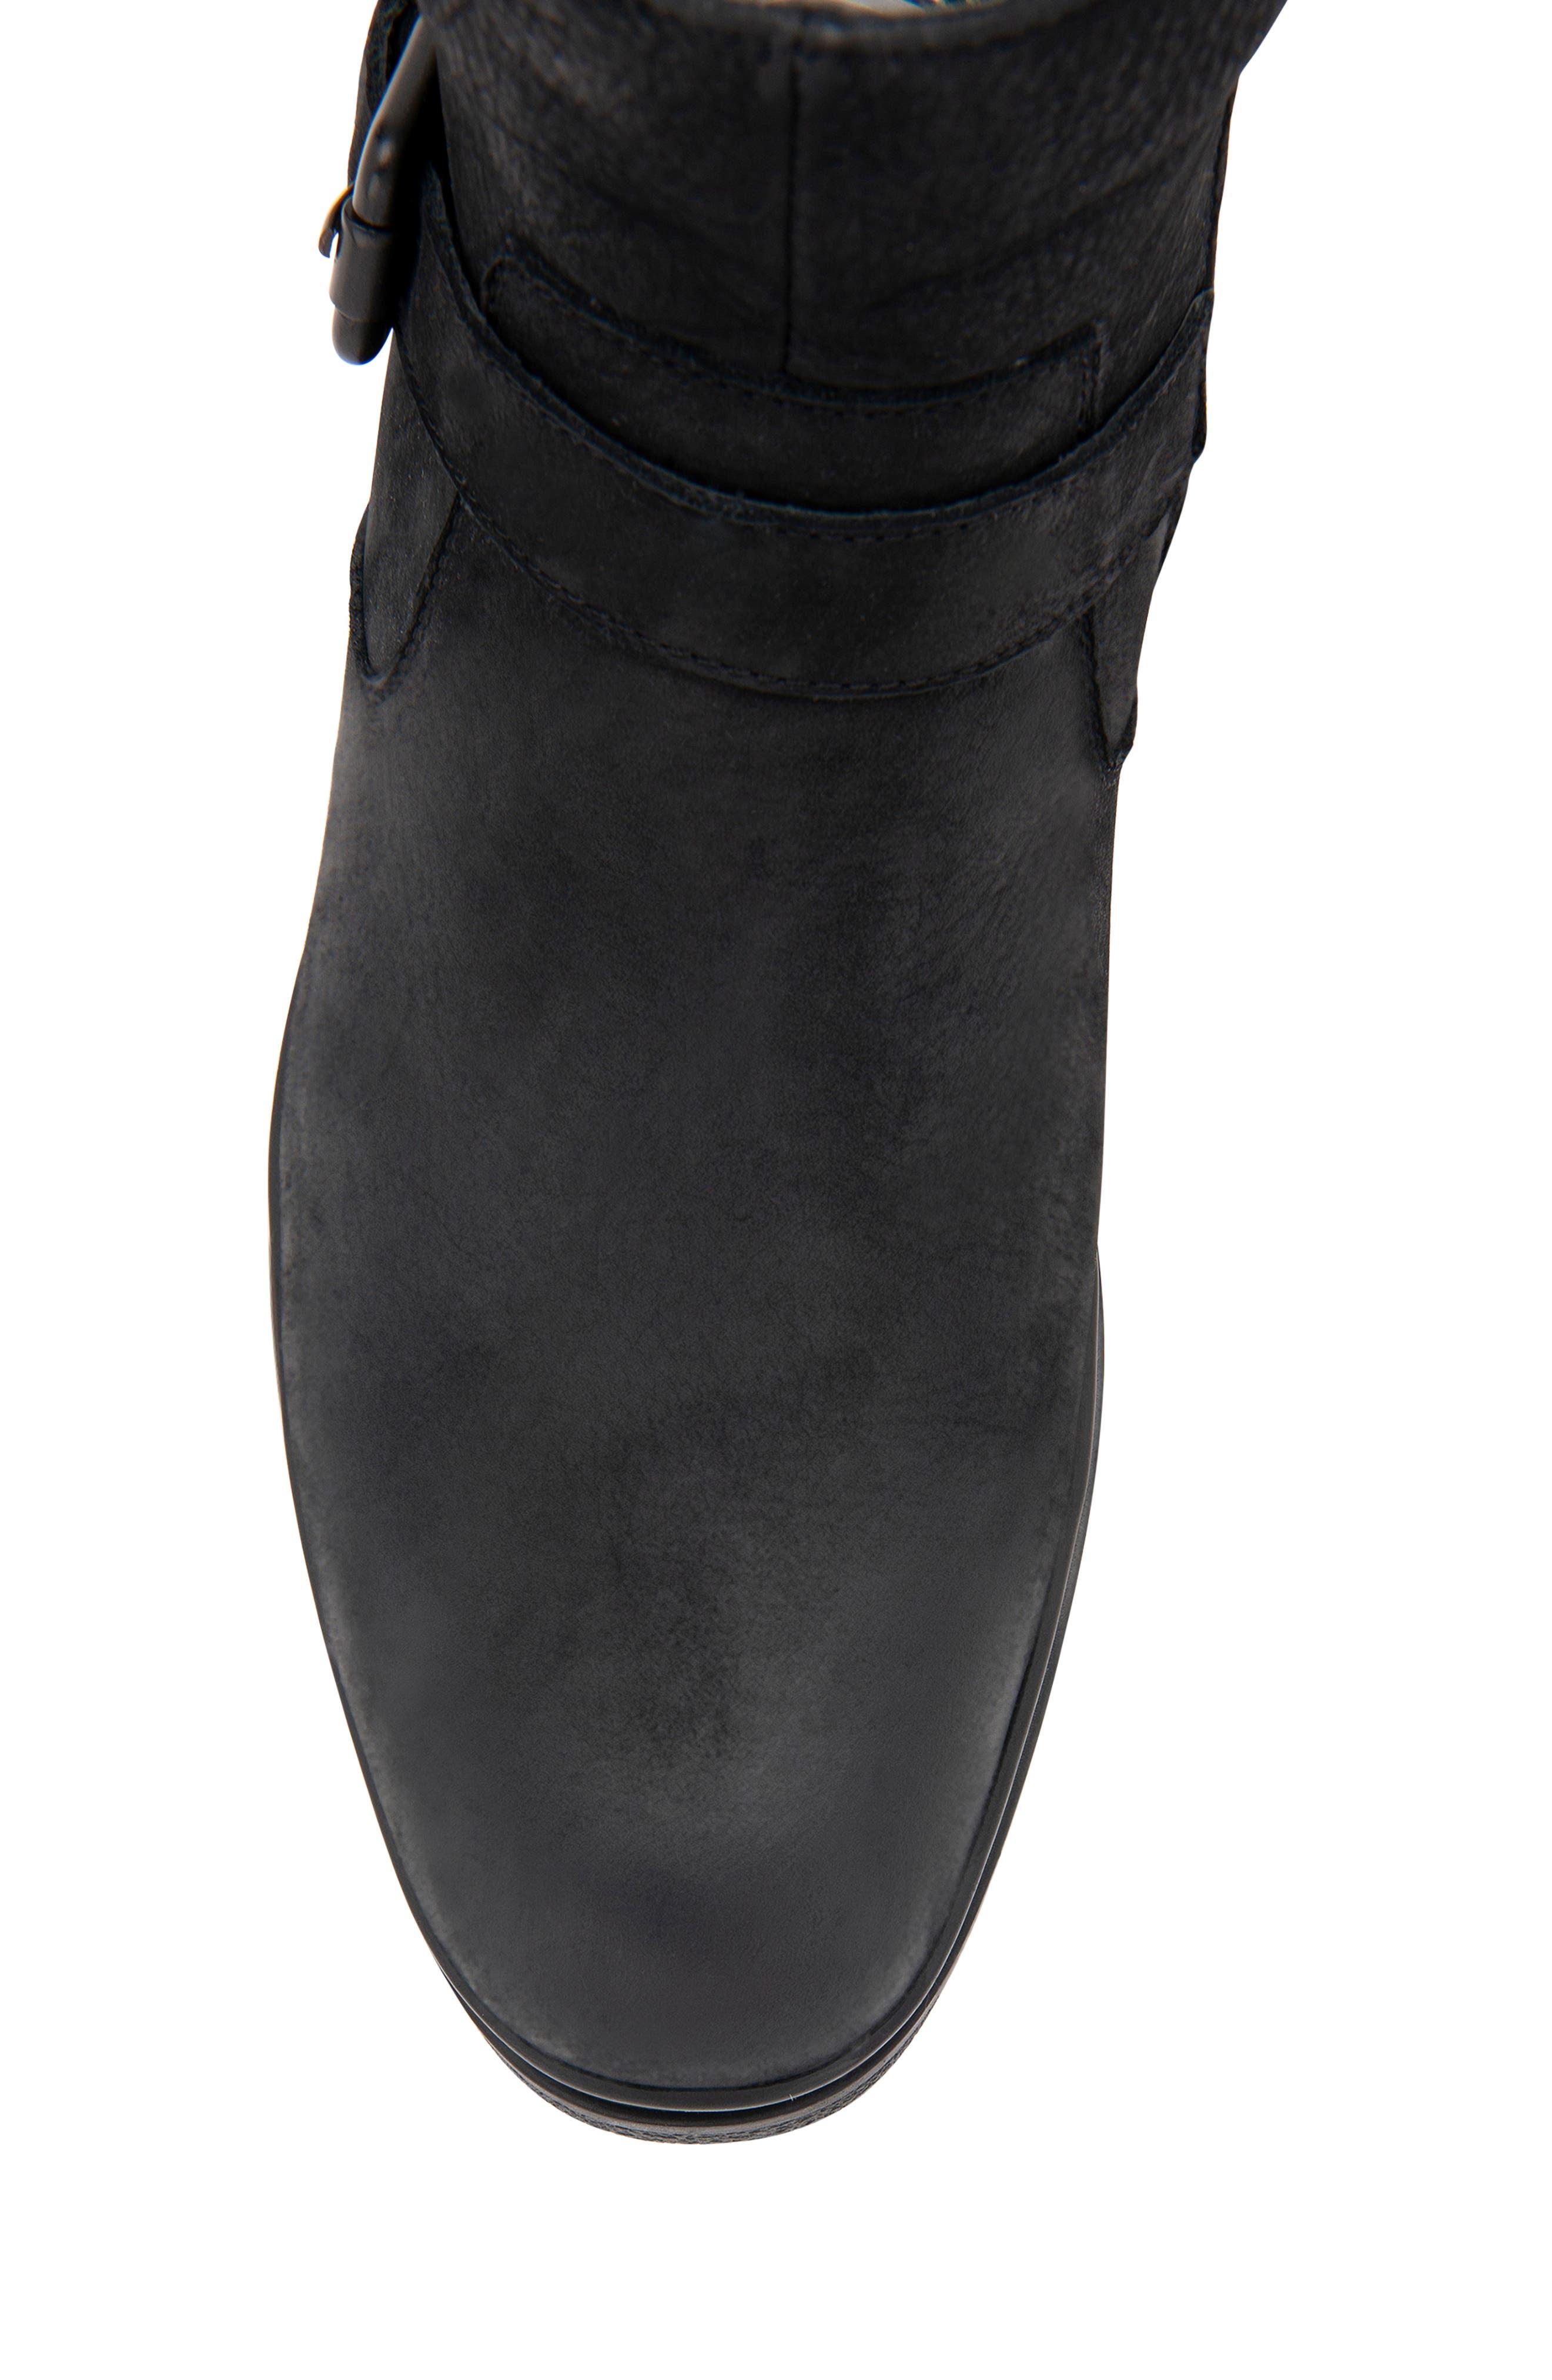 BLONDO, Sylvester Waterproof Buckle Boot, Alternate thumbnail 6, color, BLACK NUBUCK